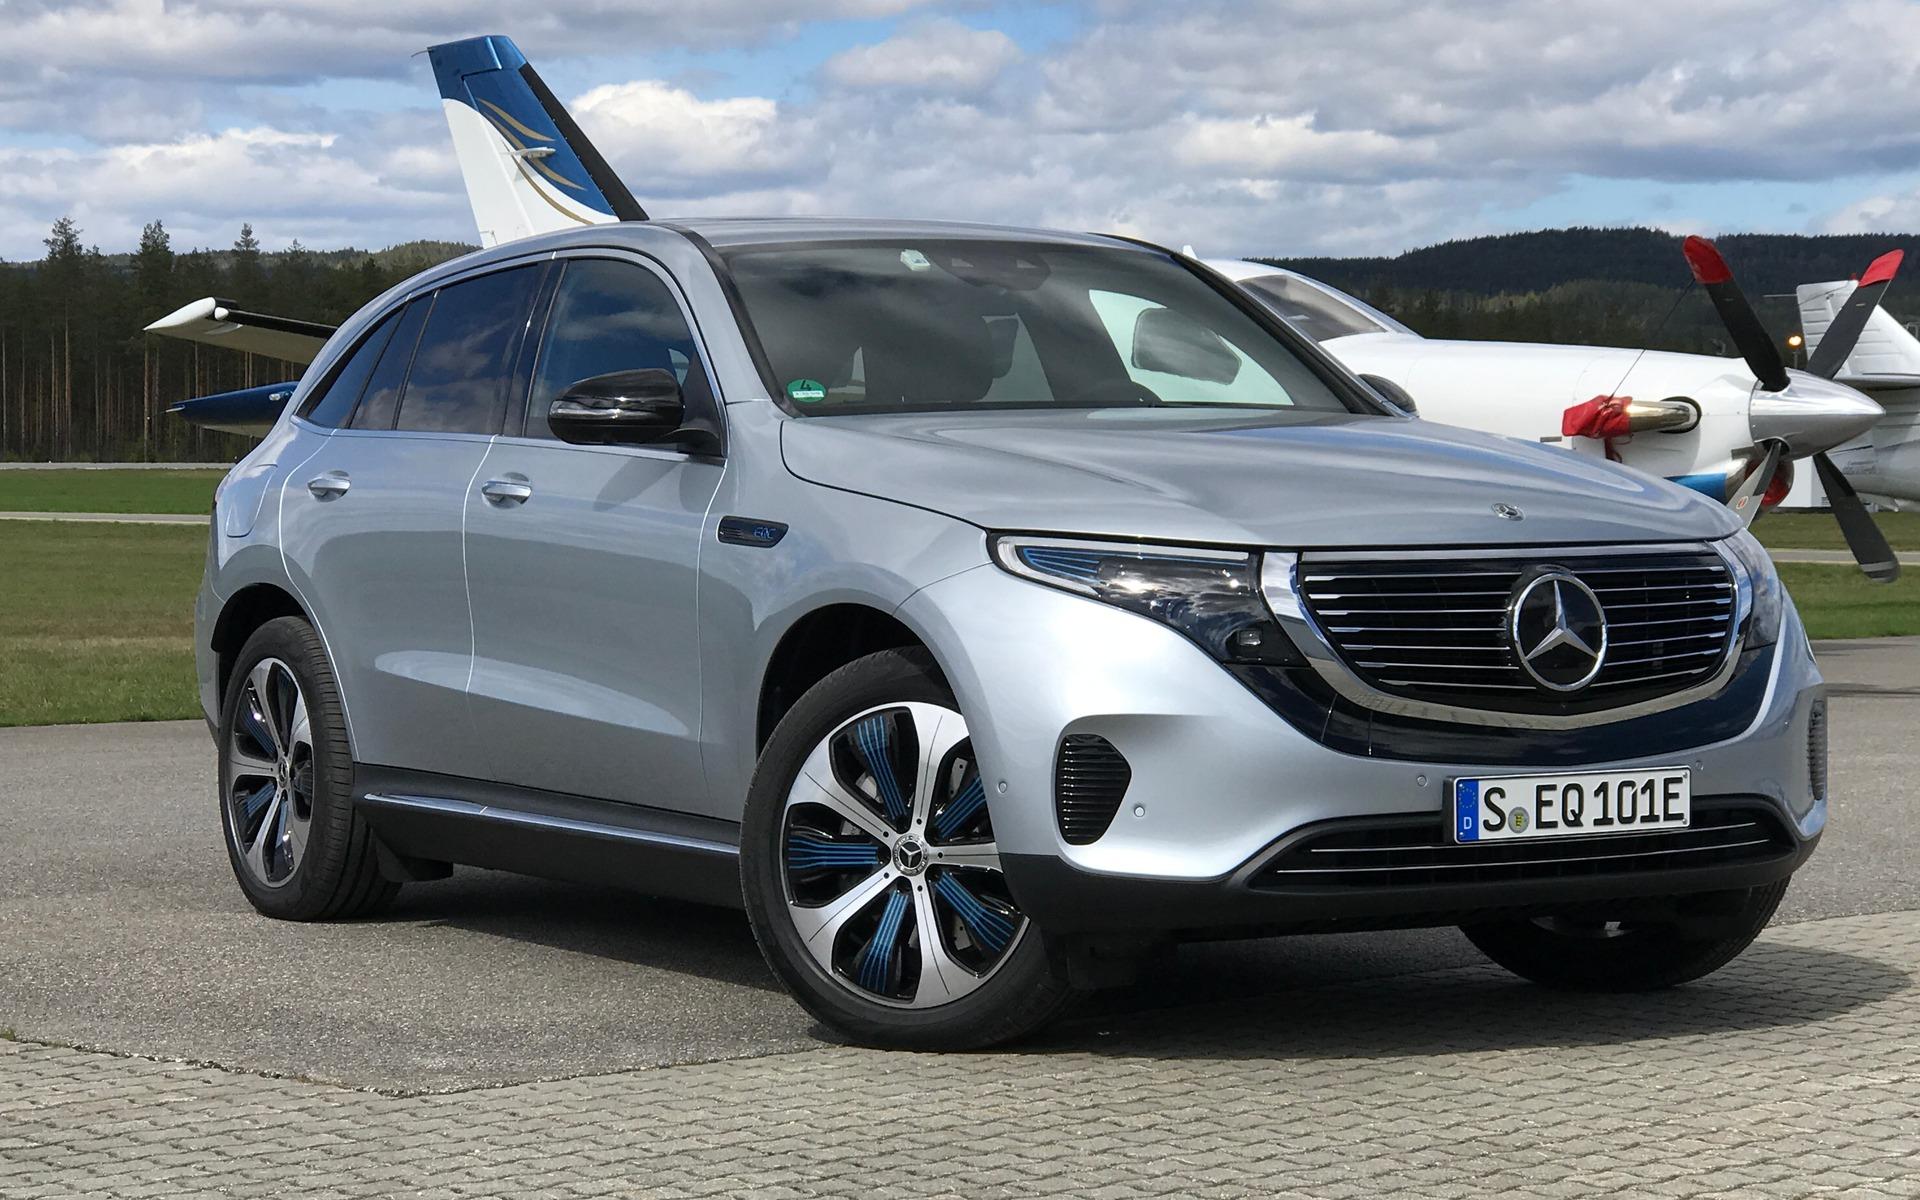 2020 Mercedes EQC: Design, Specs, Mileage, Arrival >> 2020 Mercedes Benz Eqc Put To The Test In Ev Land The Car